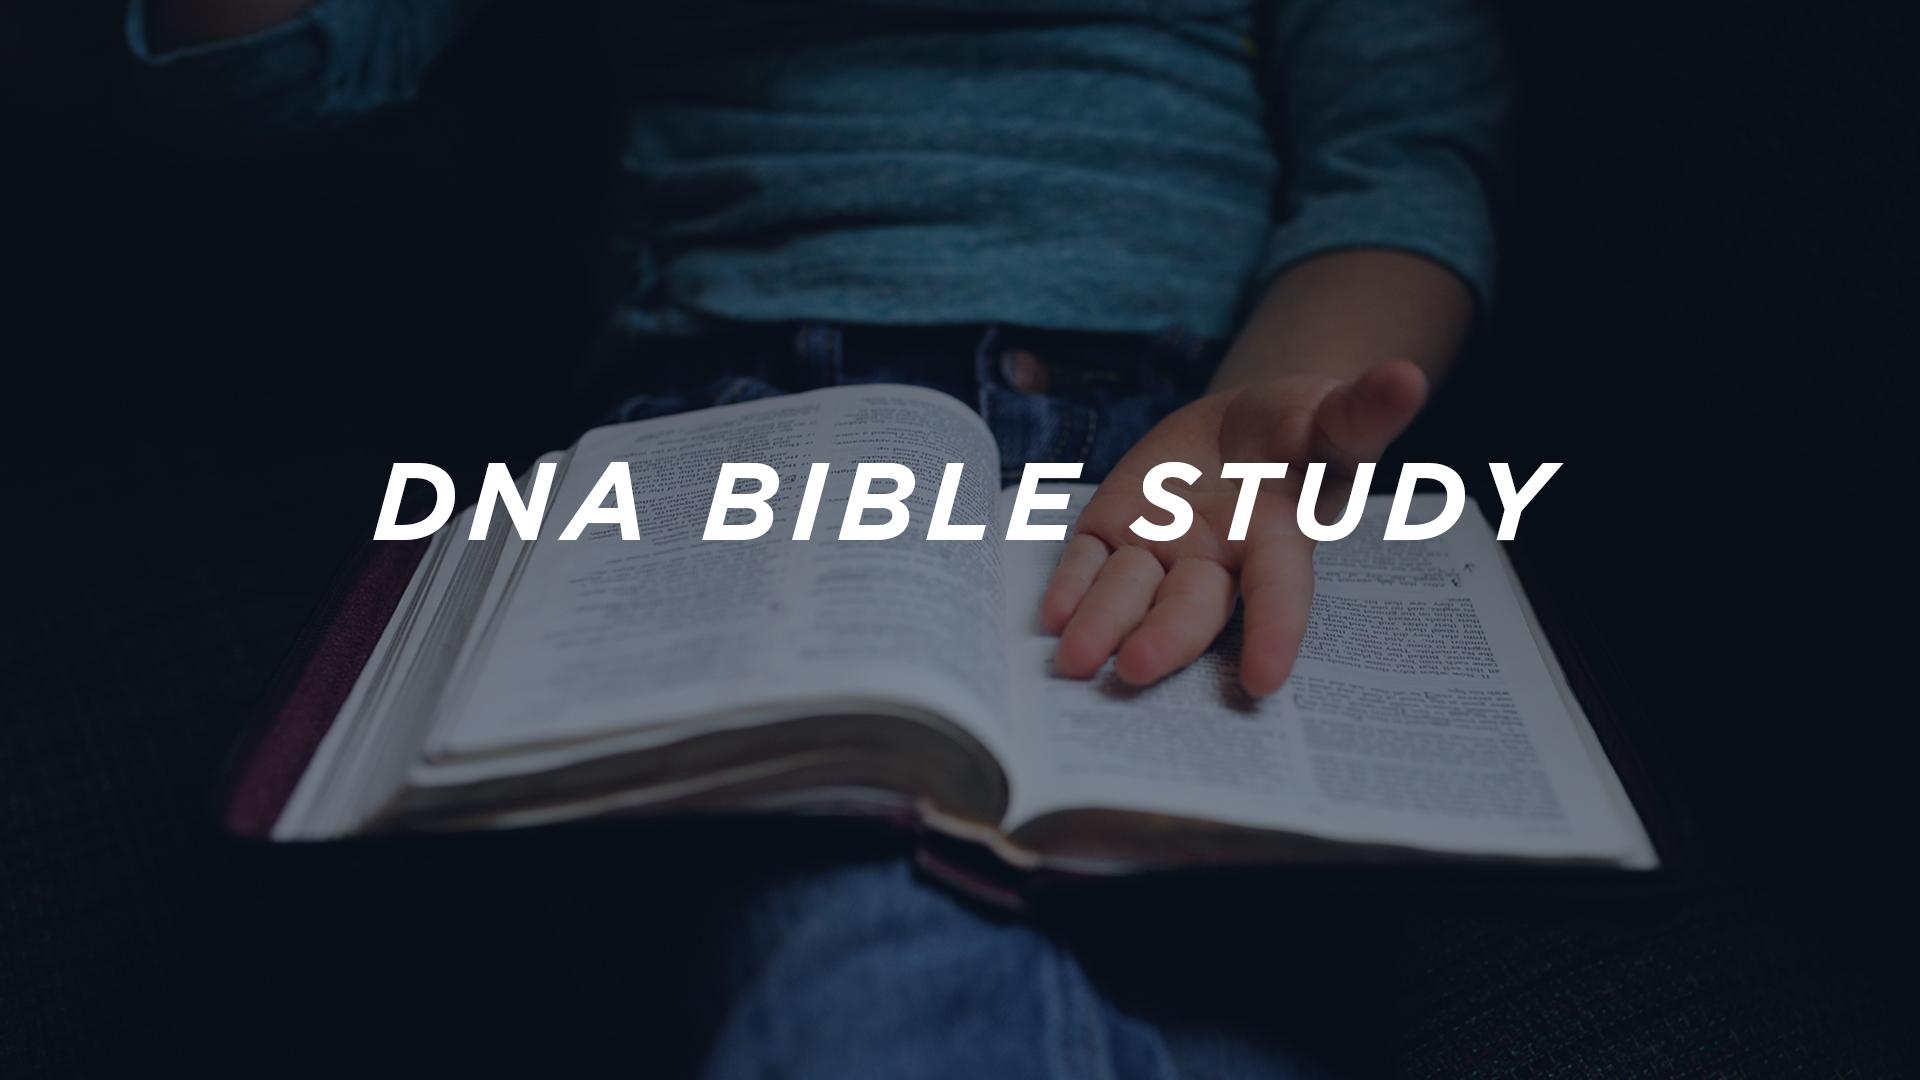 DNA-bible-study c.jpg